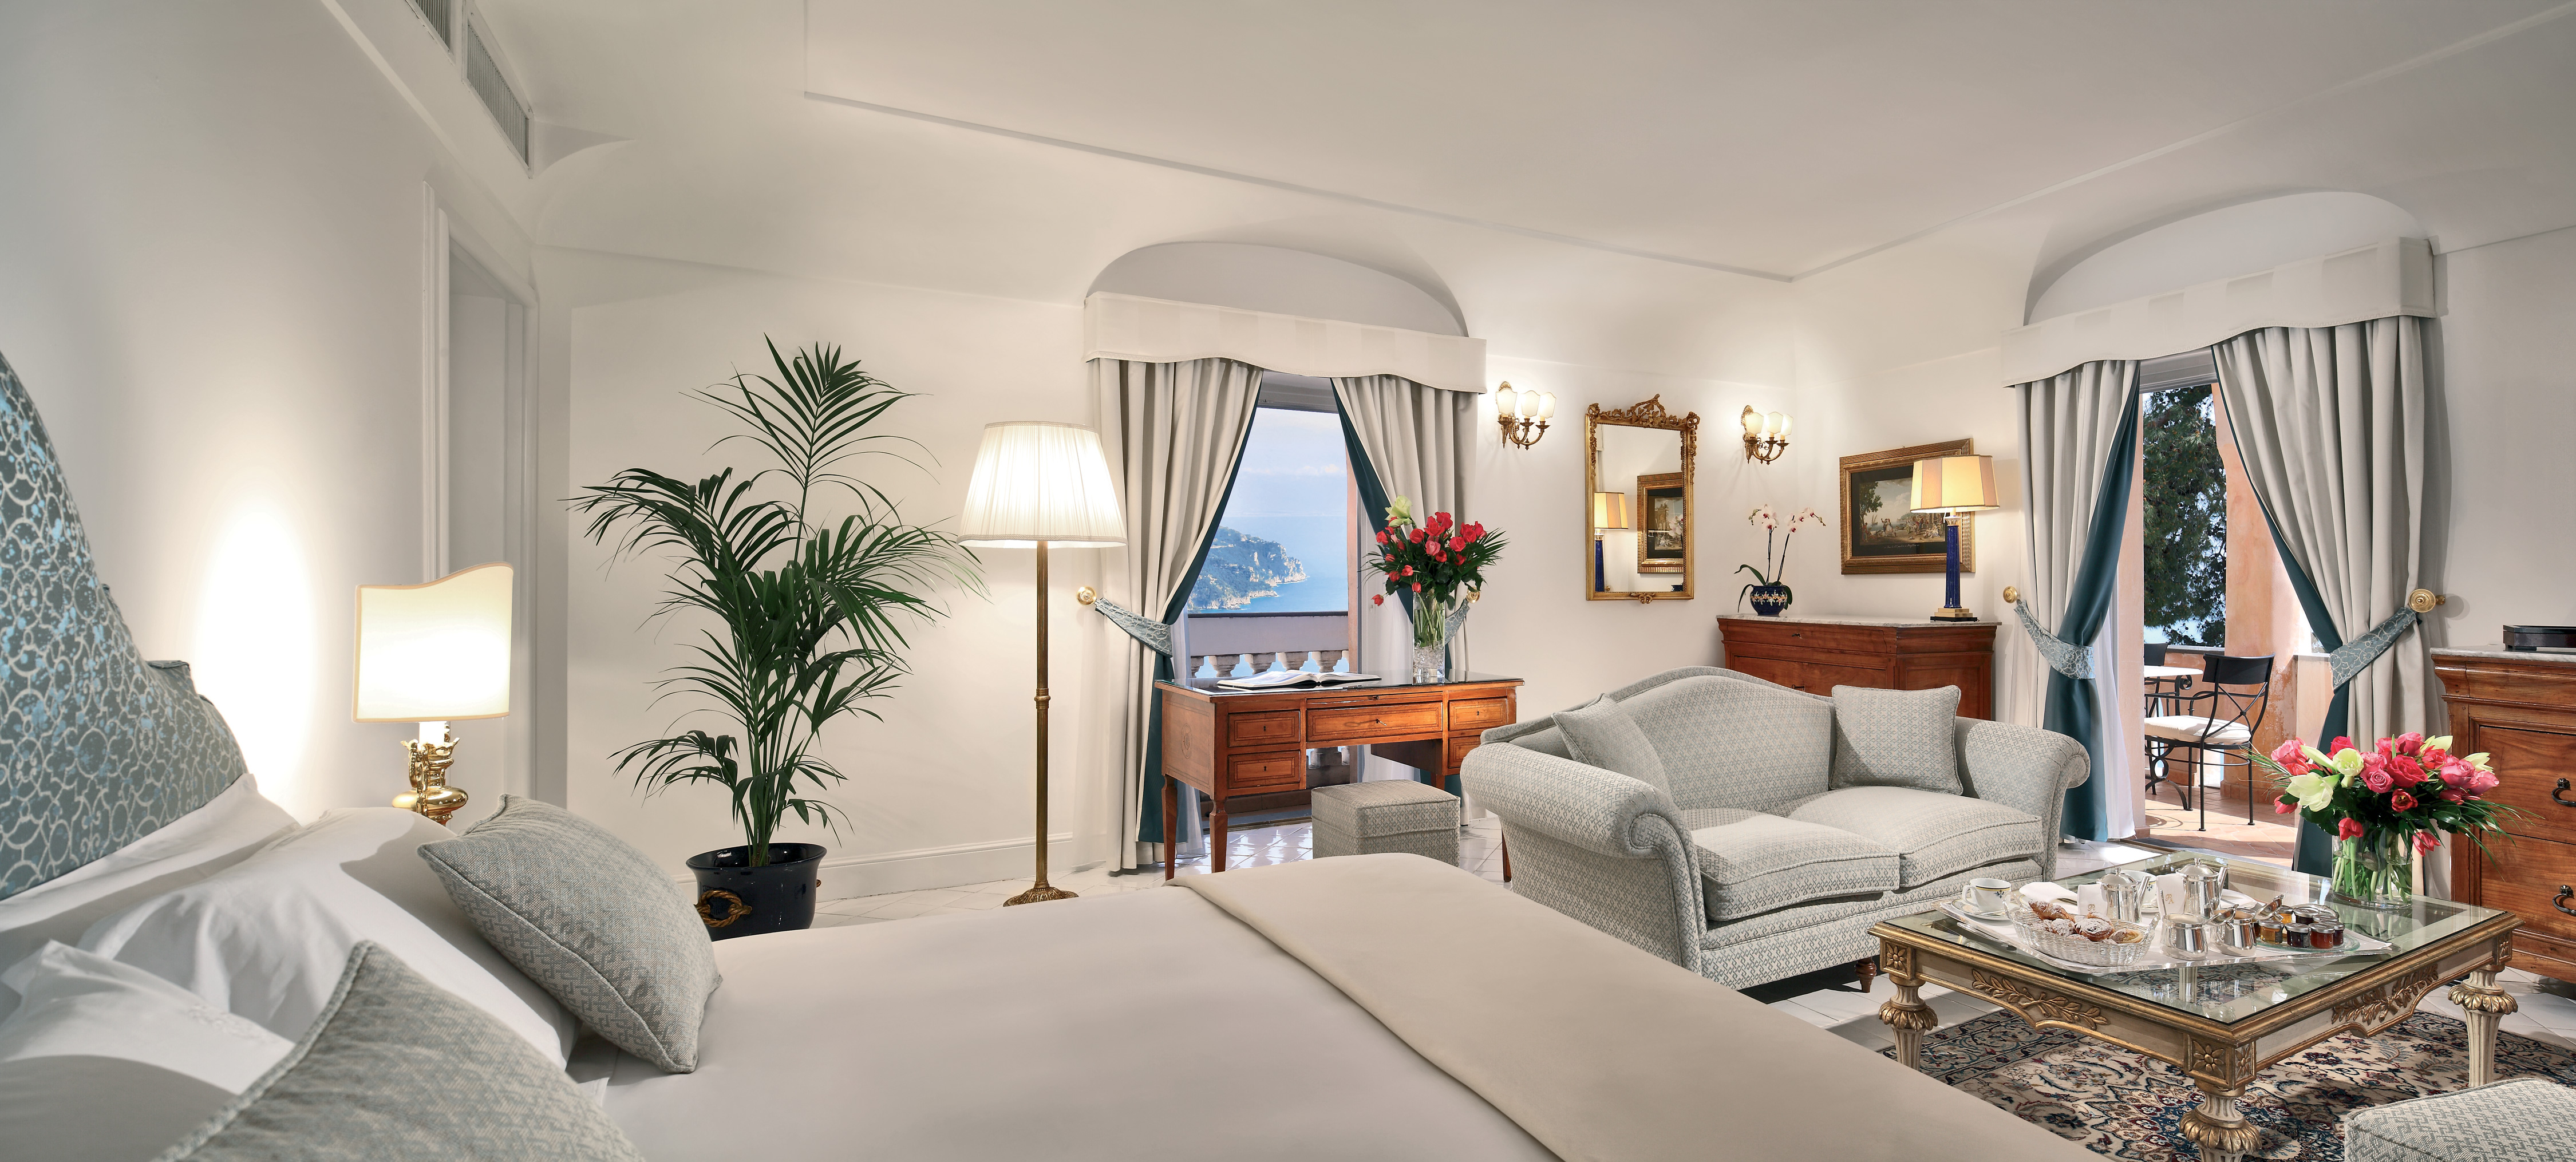 palazzo-avino-deluxe-suite-with-terrace.